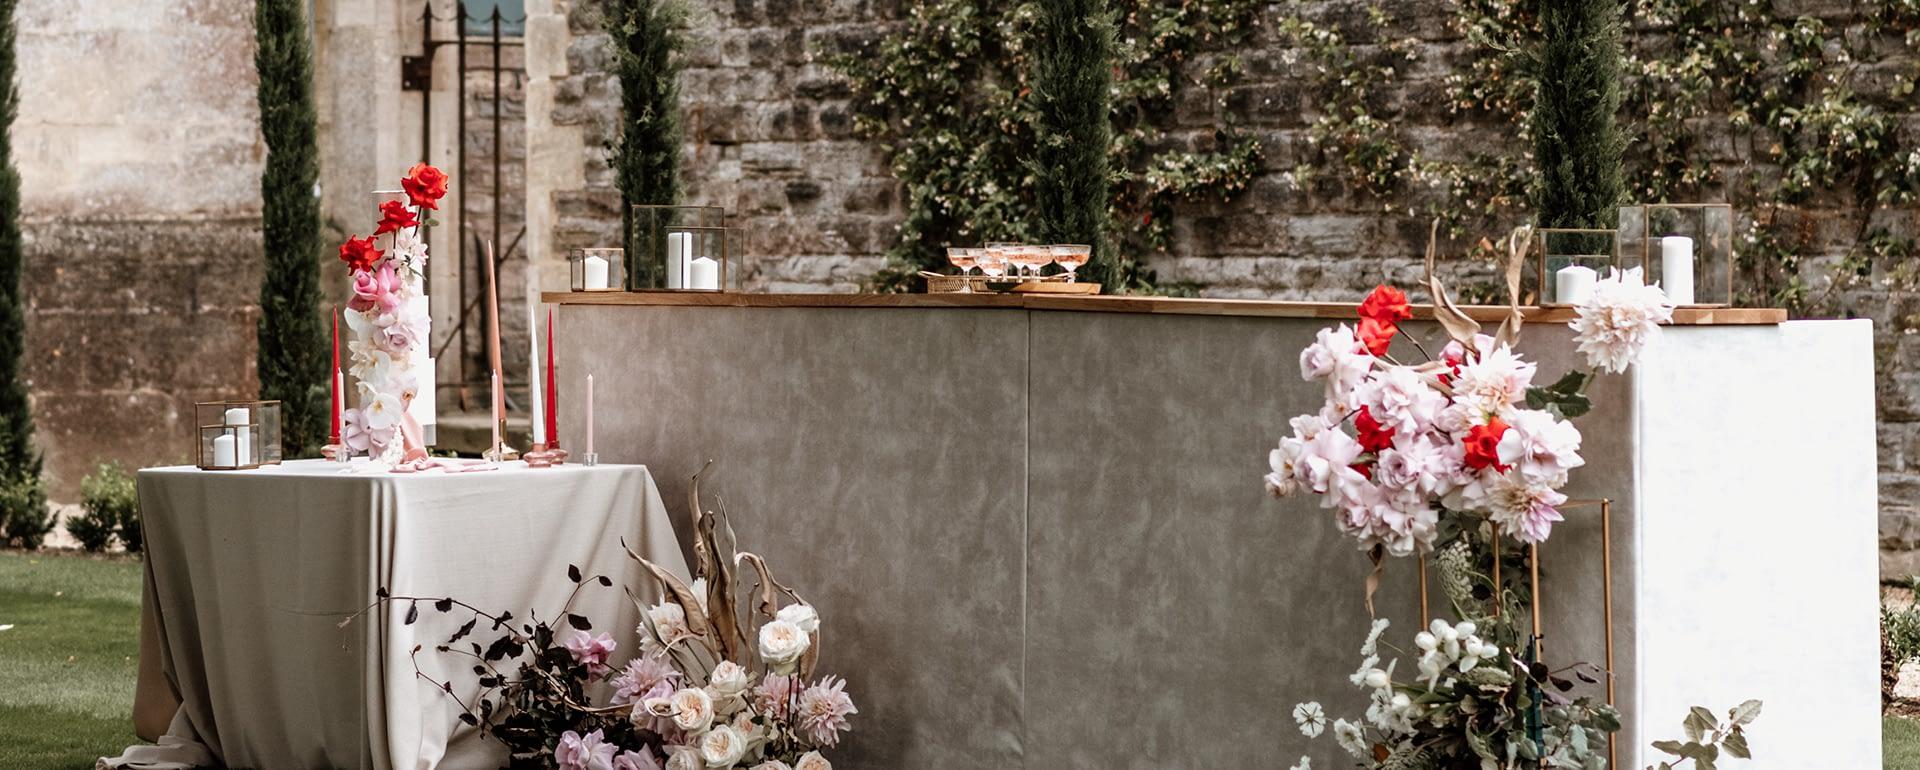 Your Perfect Wedding Drinks Reception with TwentySix